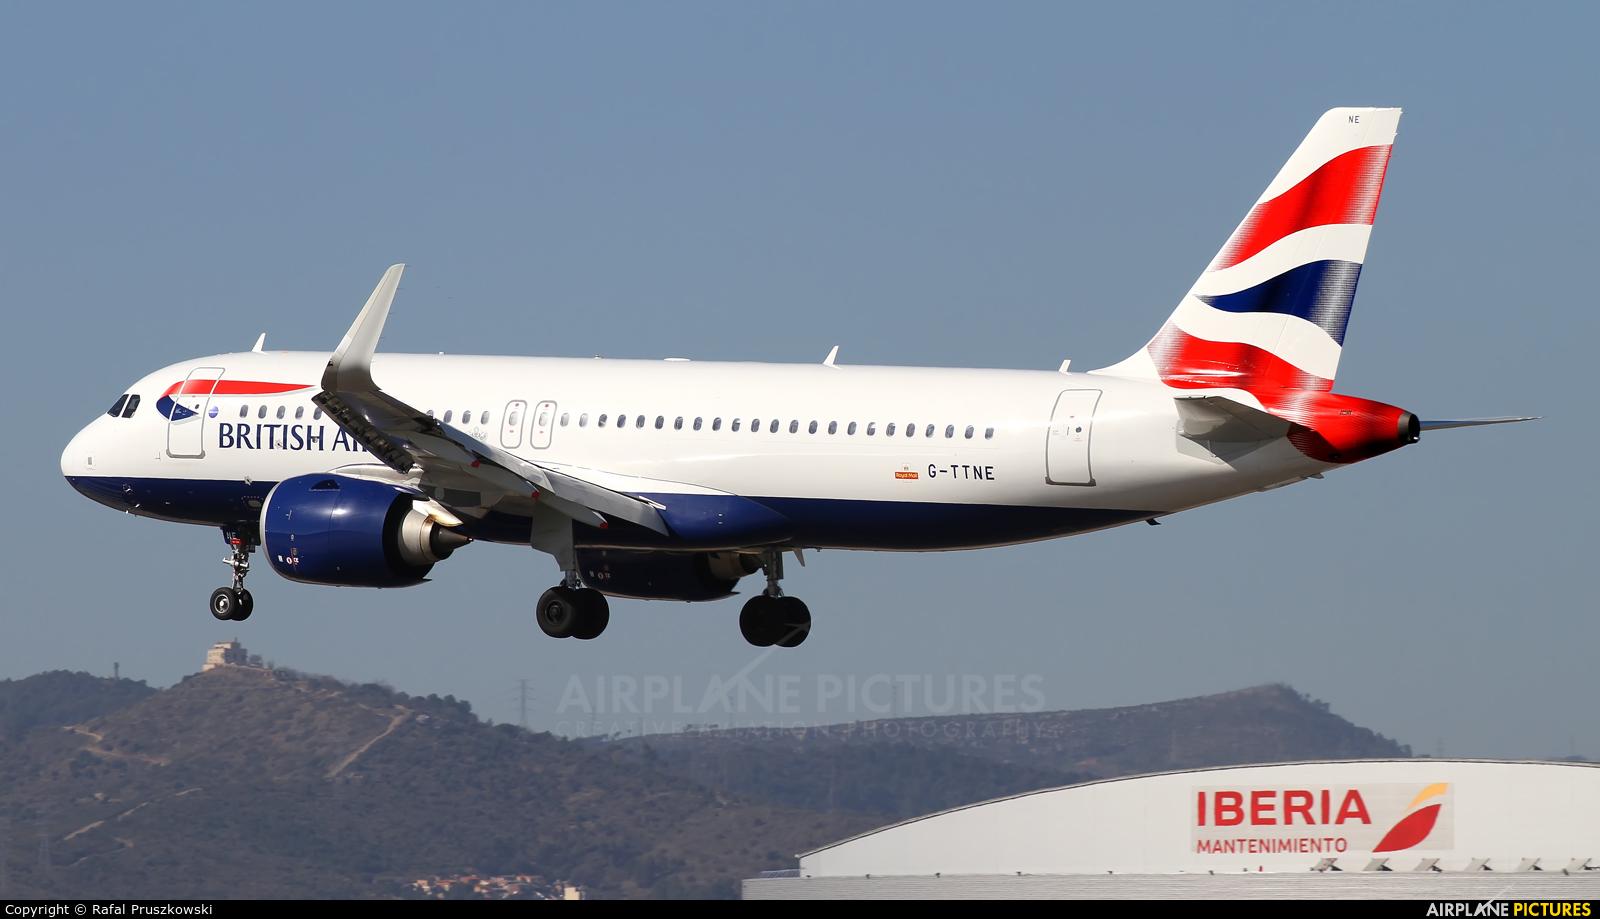 British Airways G-TTNE aircraft at Barcelona - El Prat